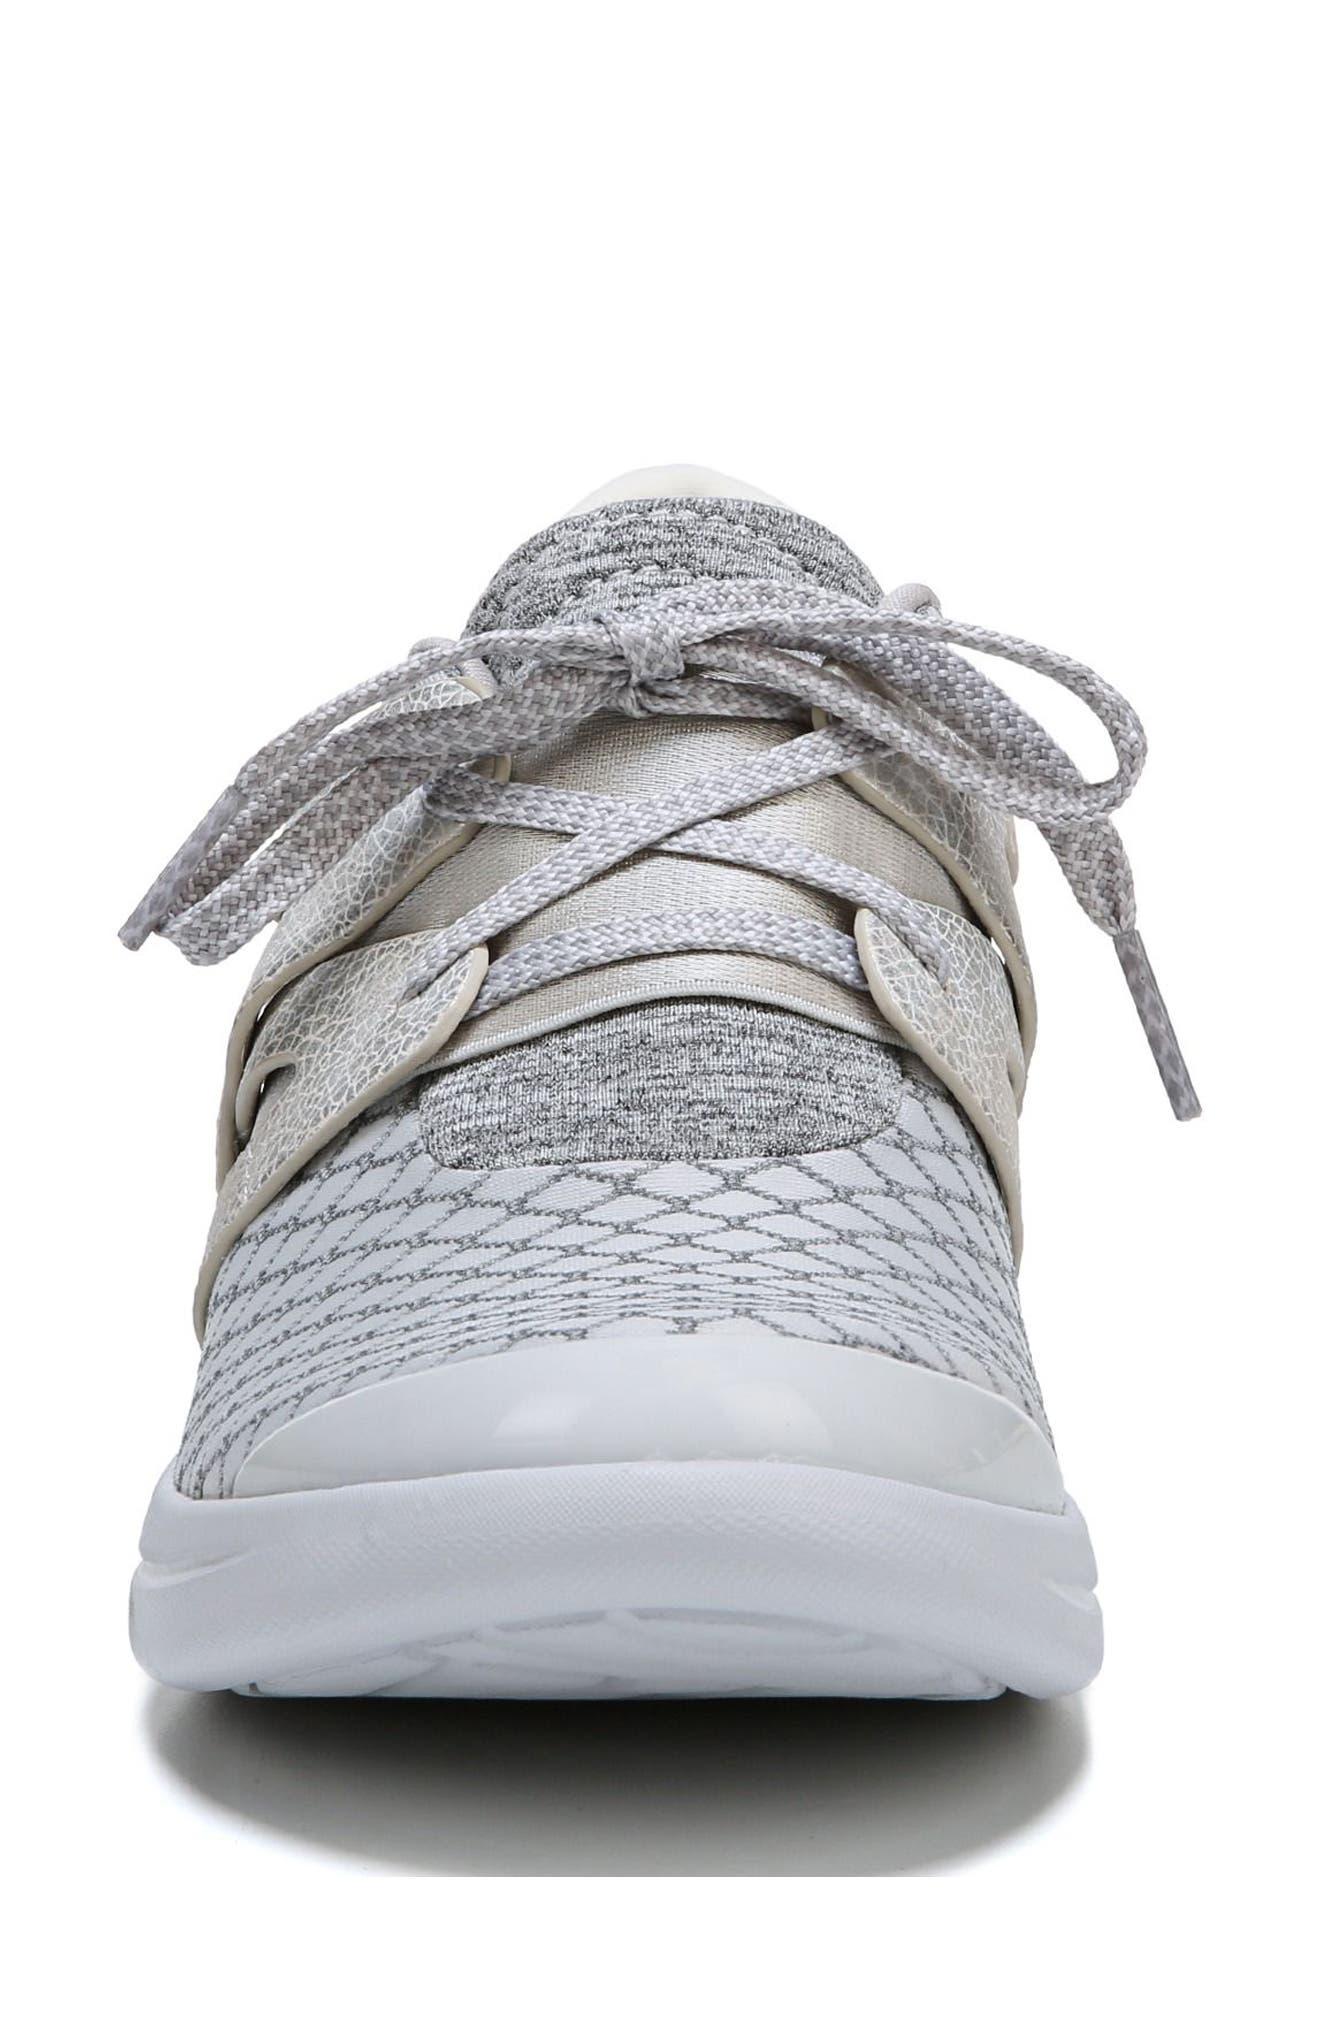 Flicker Sneaker,                             Alternate thumbnail 5, color,                             Grey Fabric